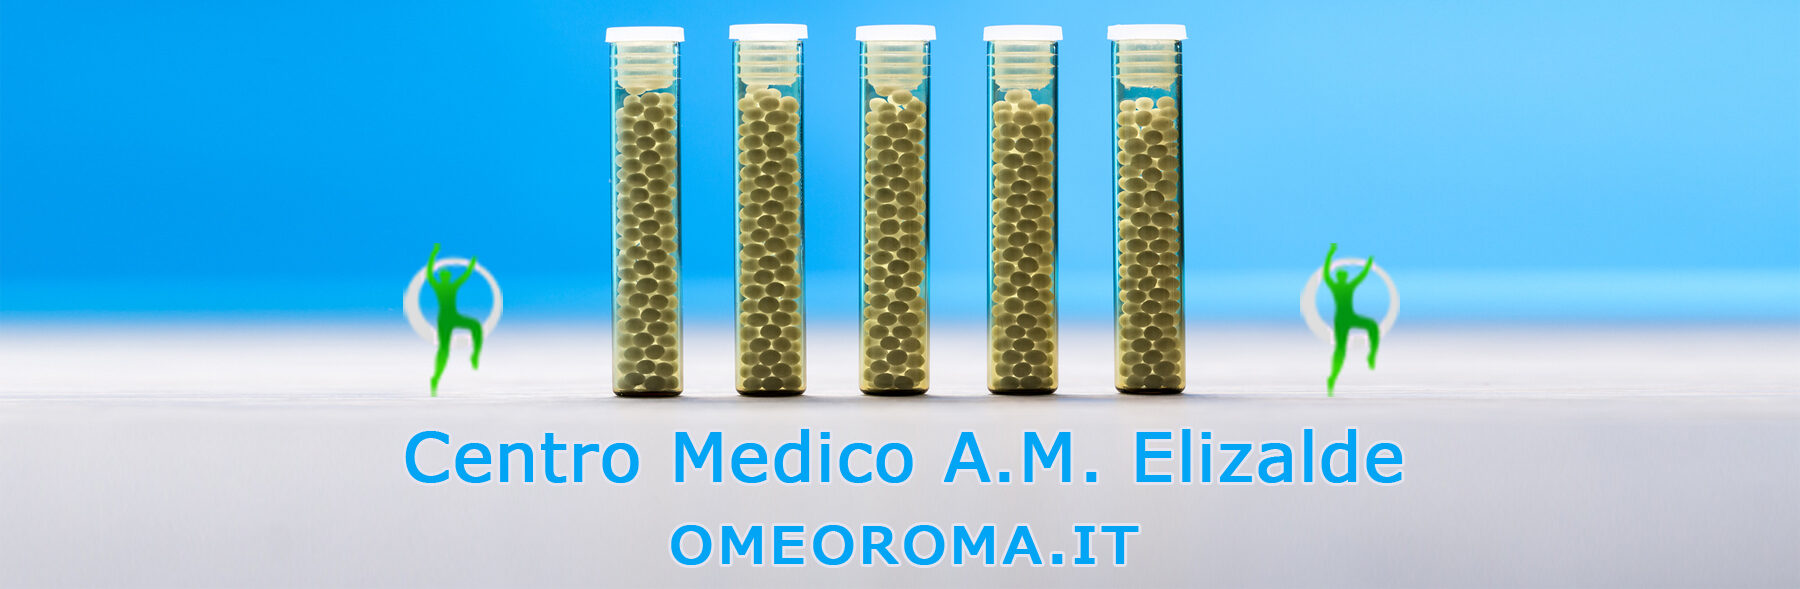 Omeoroma – Istituto A.M.Elizalde